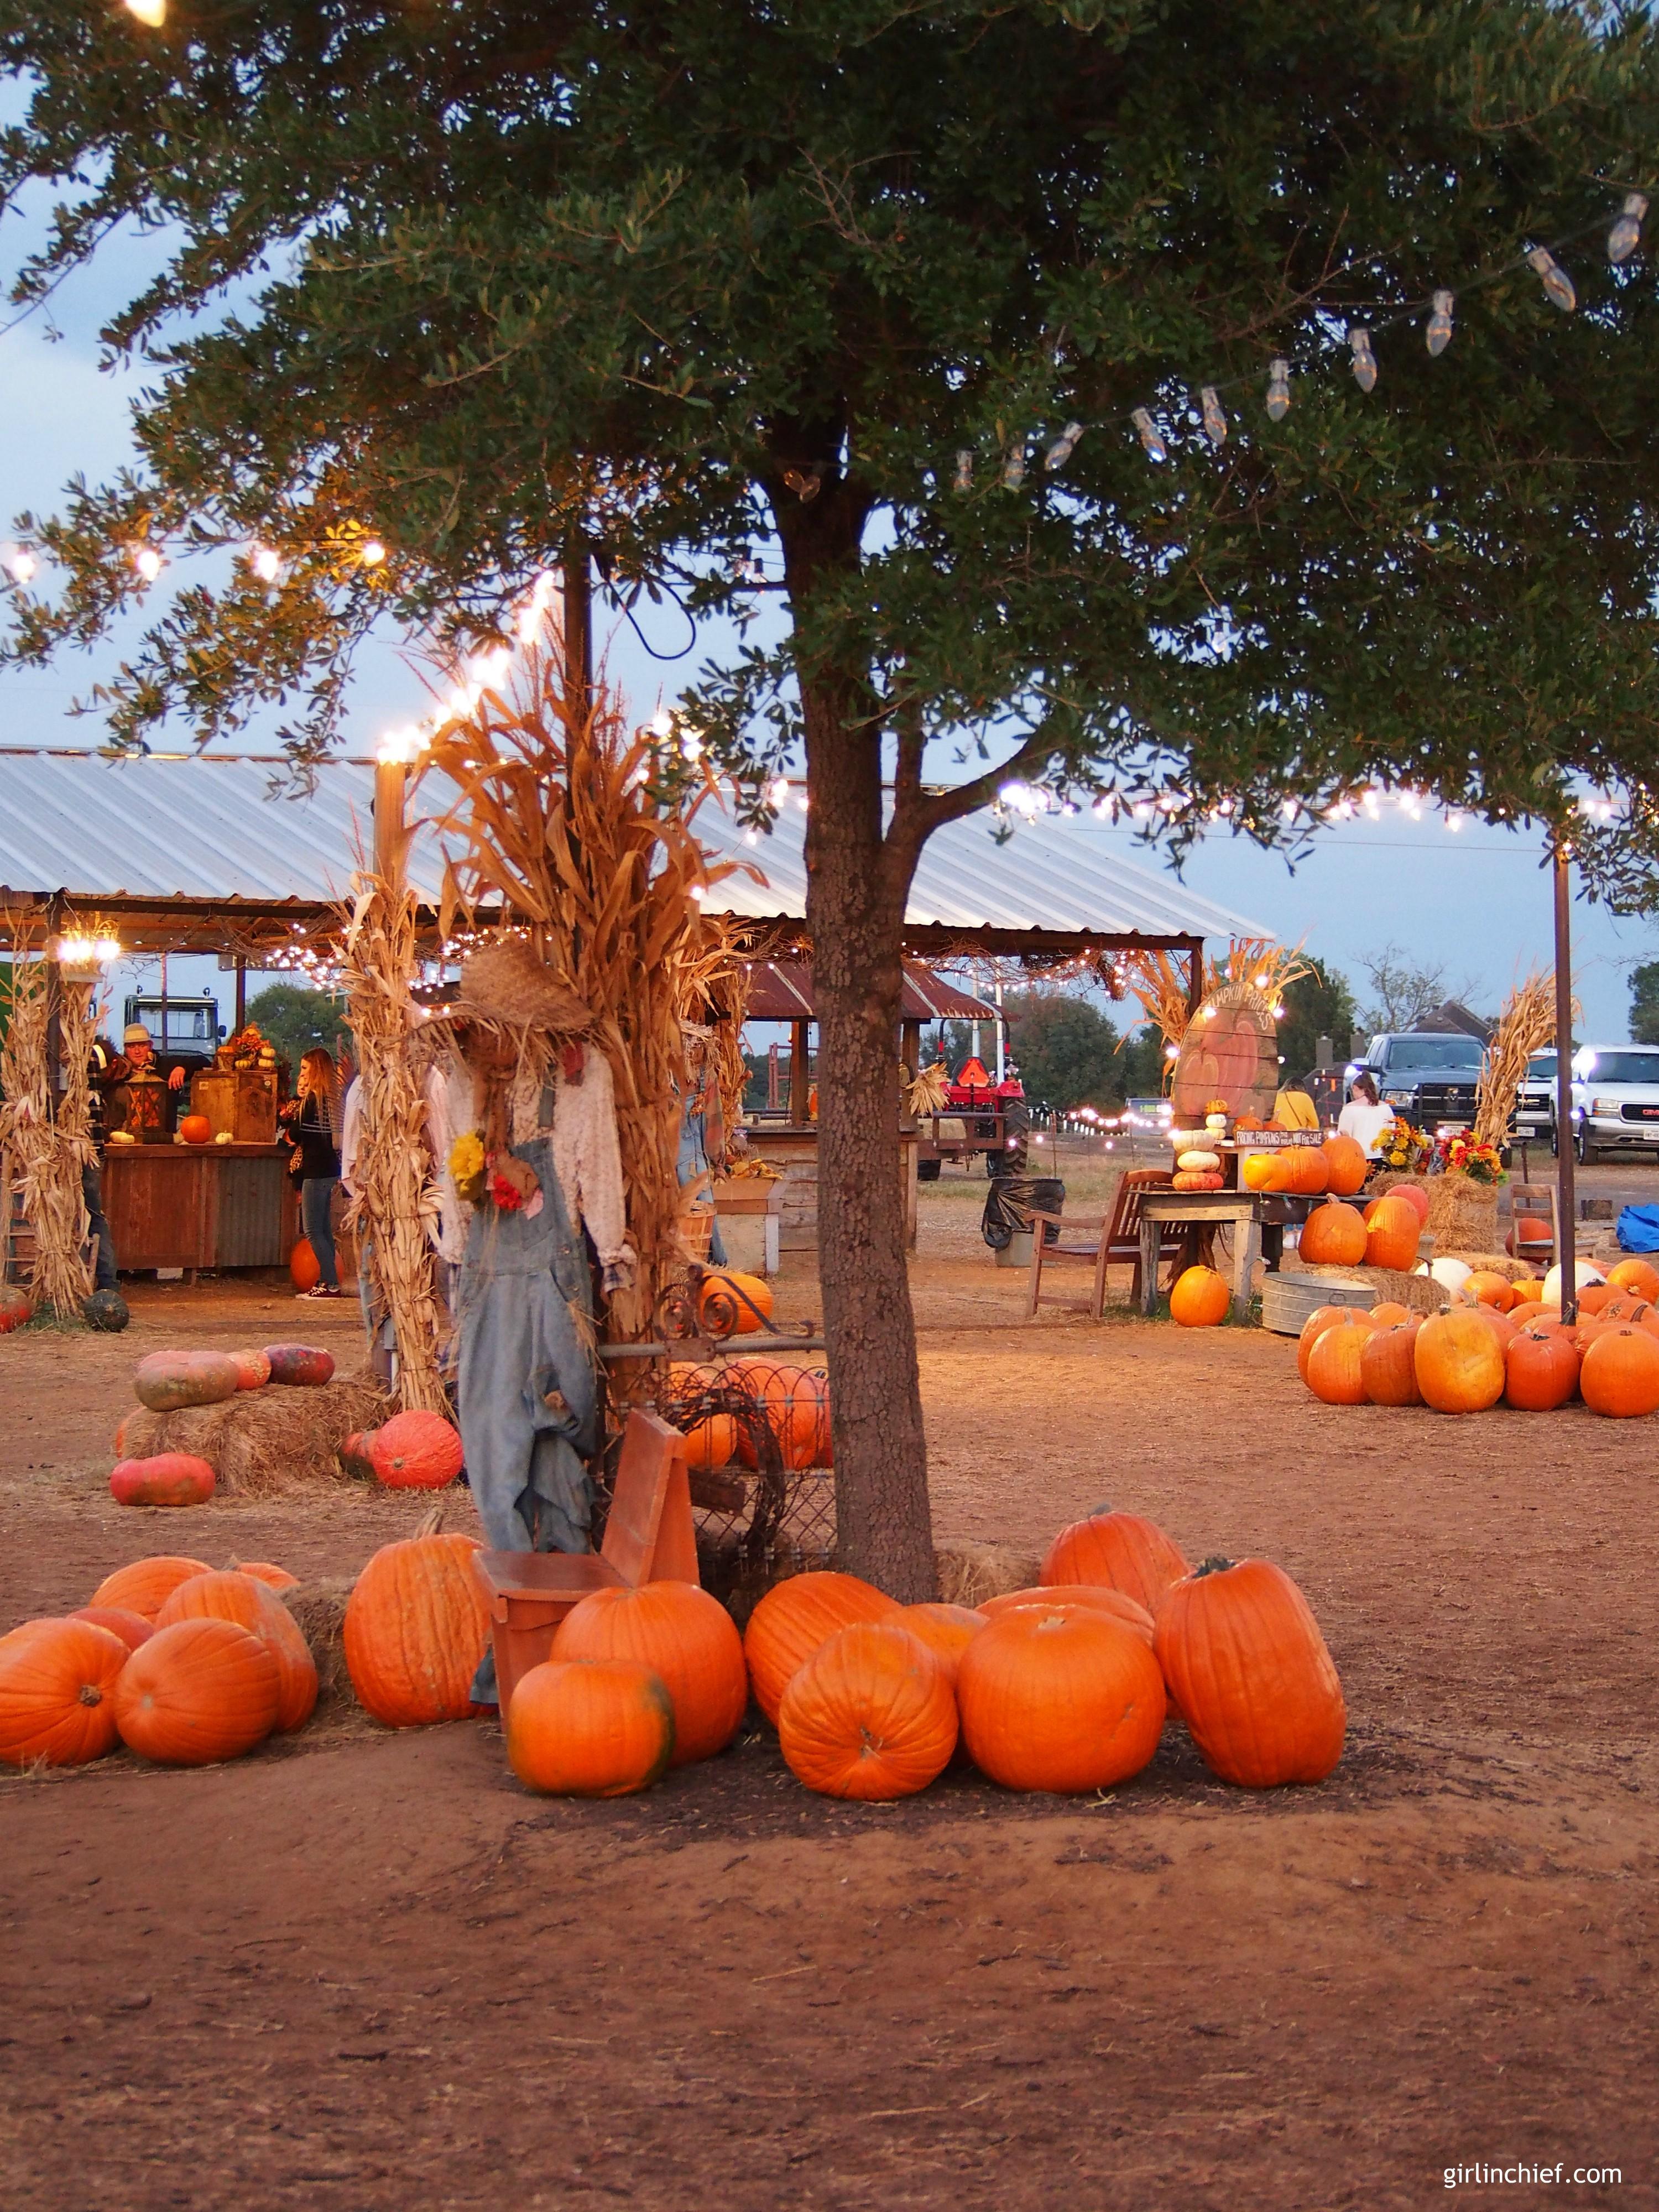 halls-pumpkin-farm-grapevine-tx-girlinchief